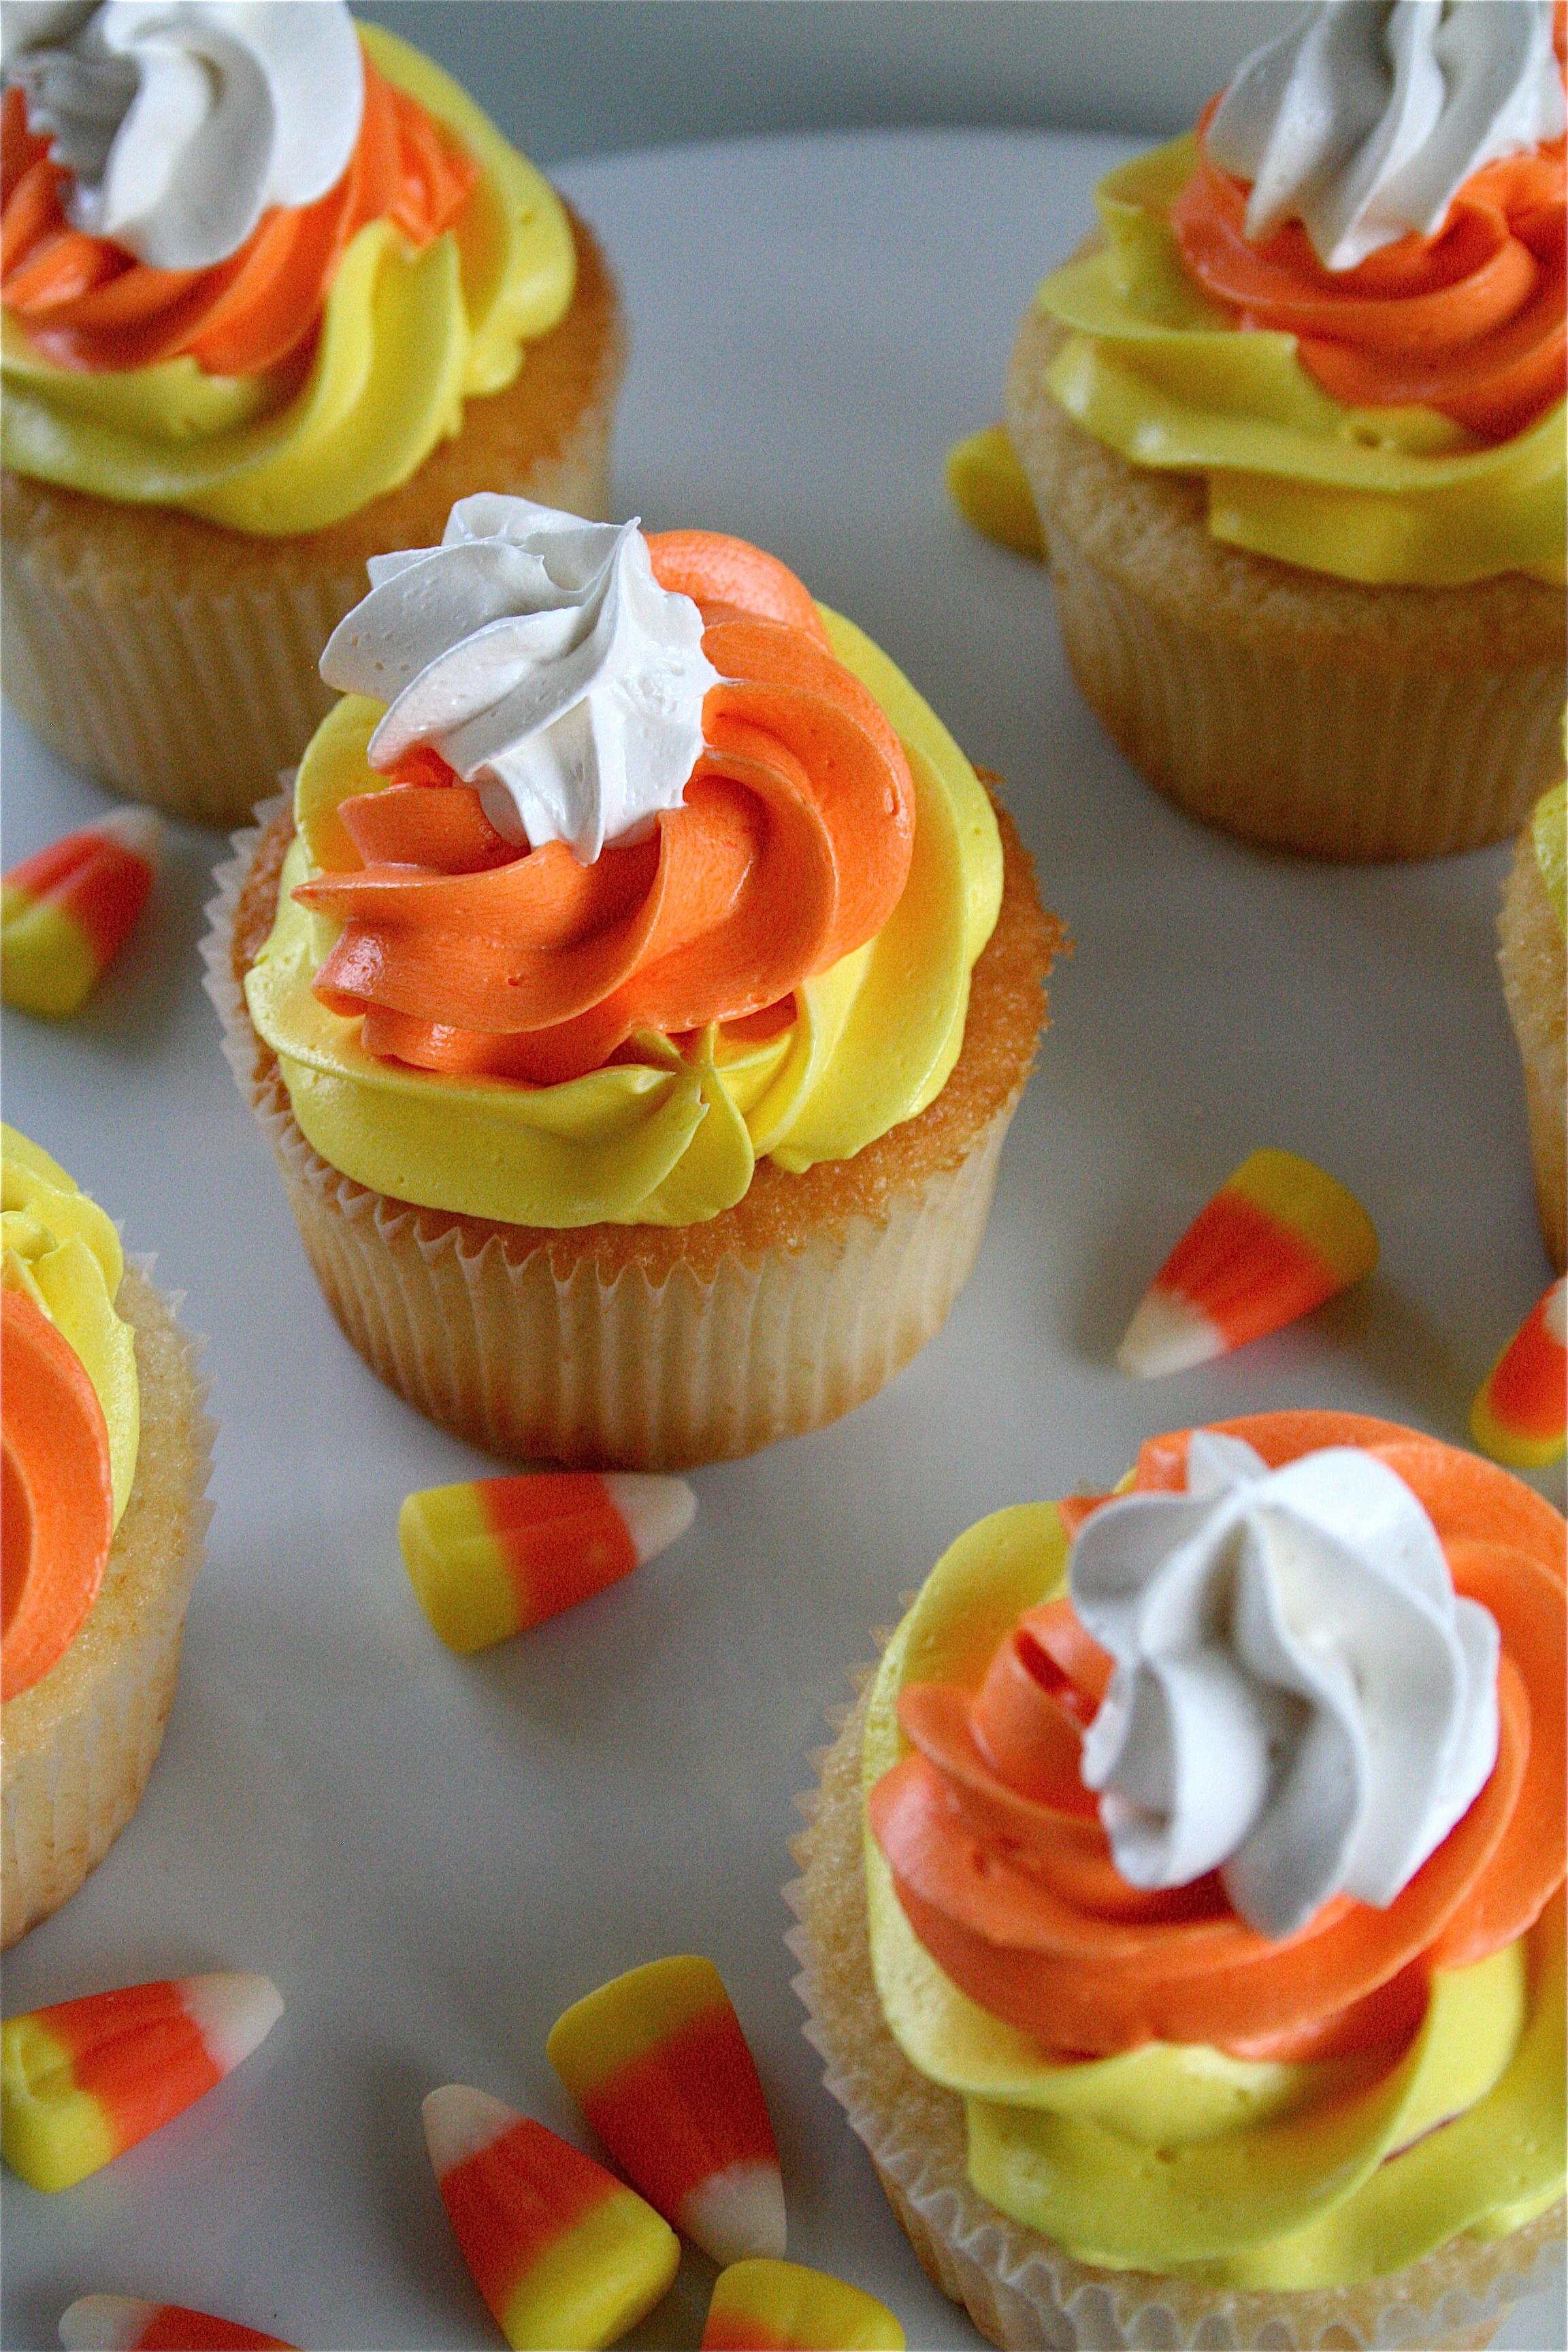 Recipe For Halloween Cupcakes  28 Cute Halloween Cupcakes Easy Recipes for Halloween